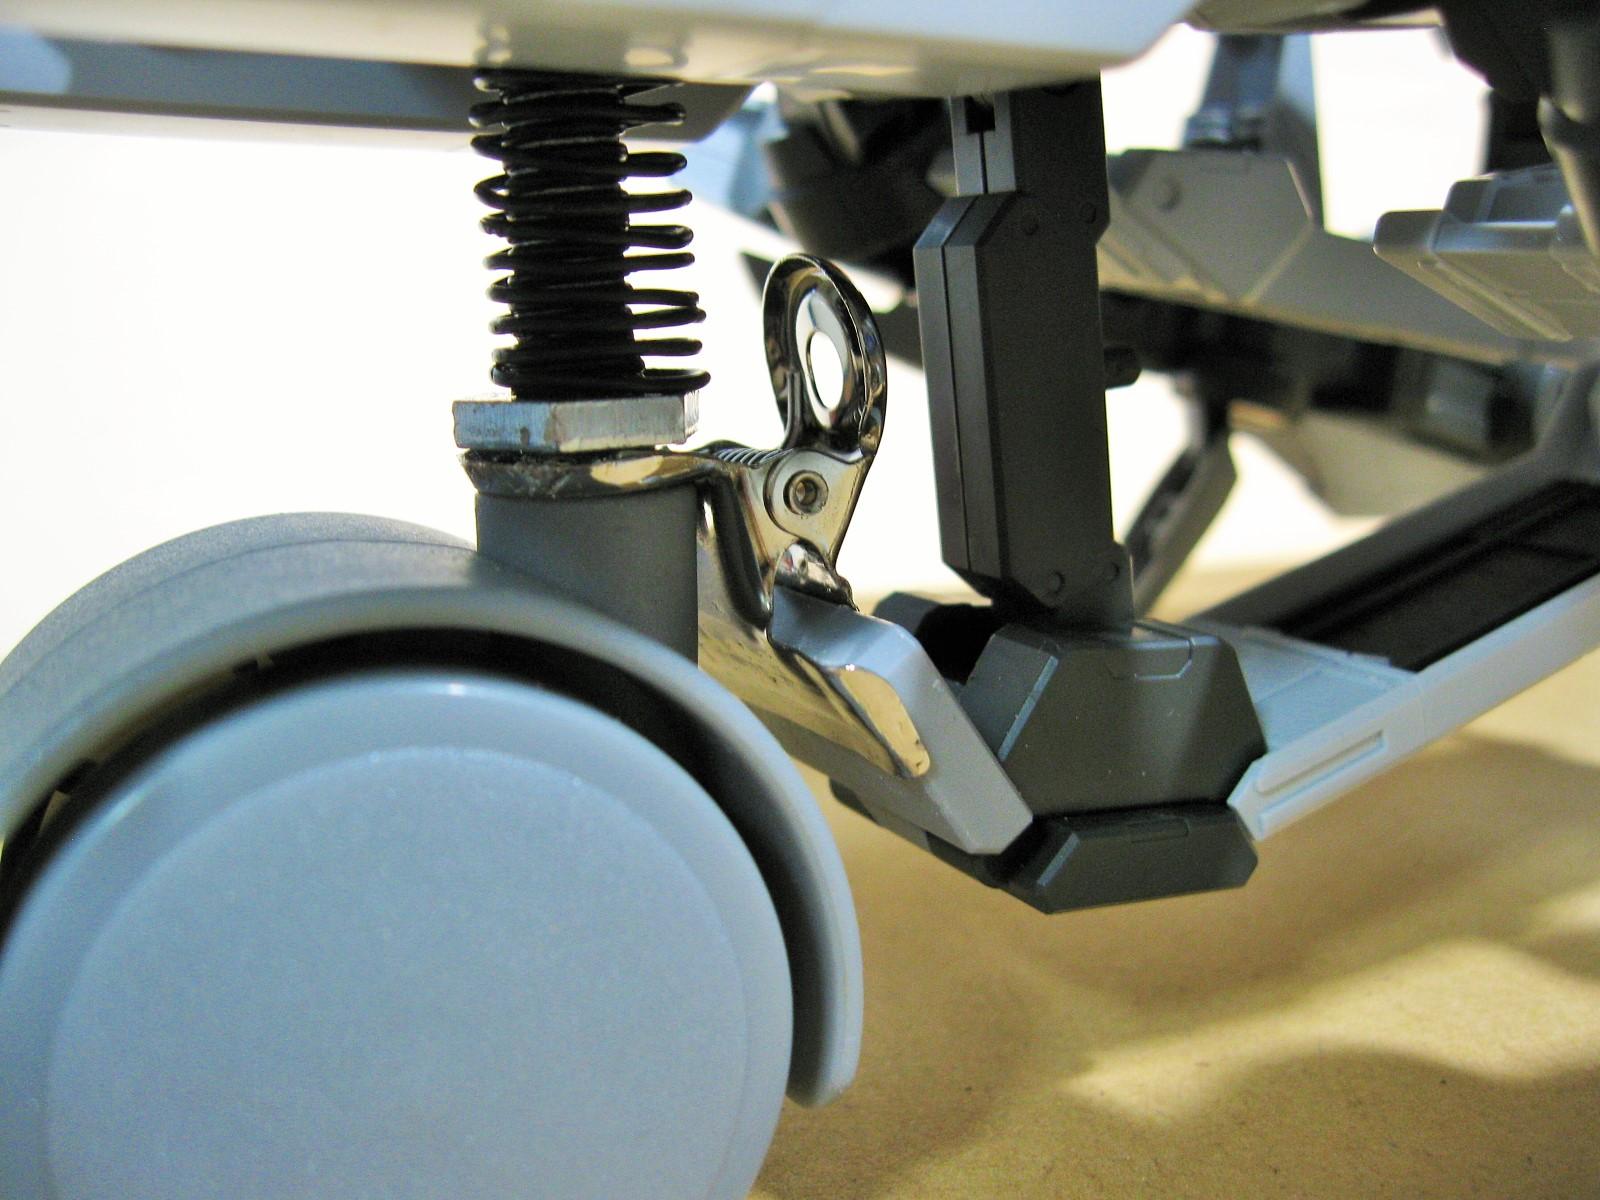 Long-distance transportation machinery 長距離輸送機「クタン参型」に地上用パーツを作成 タイヤ ホバー ホバークラフト